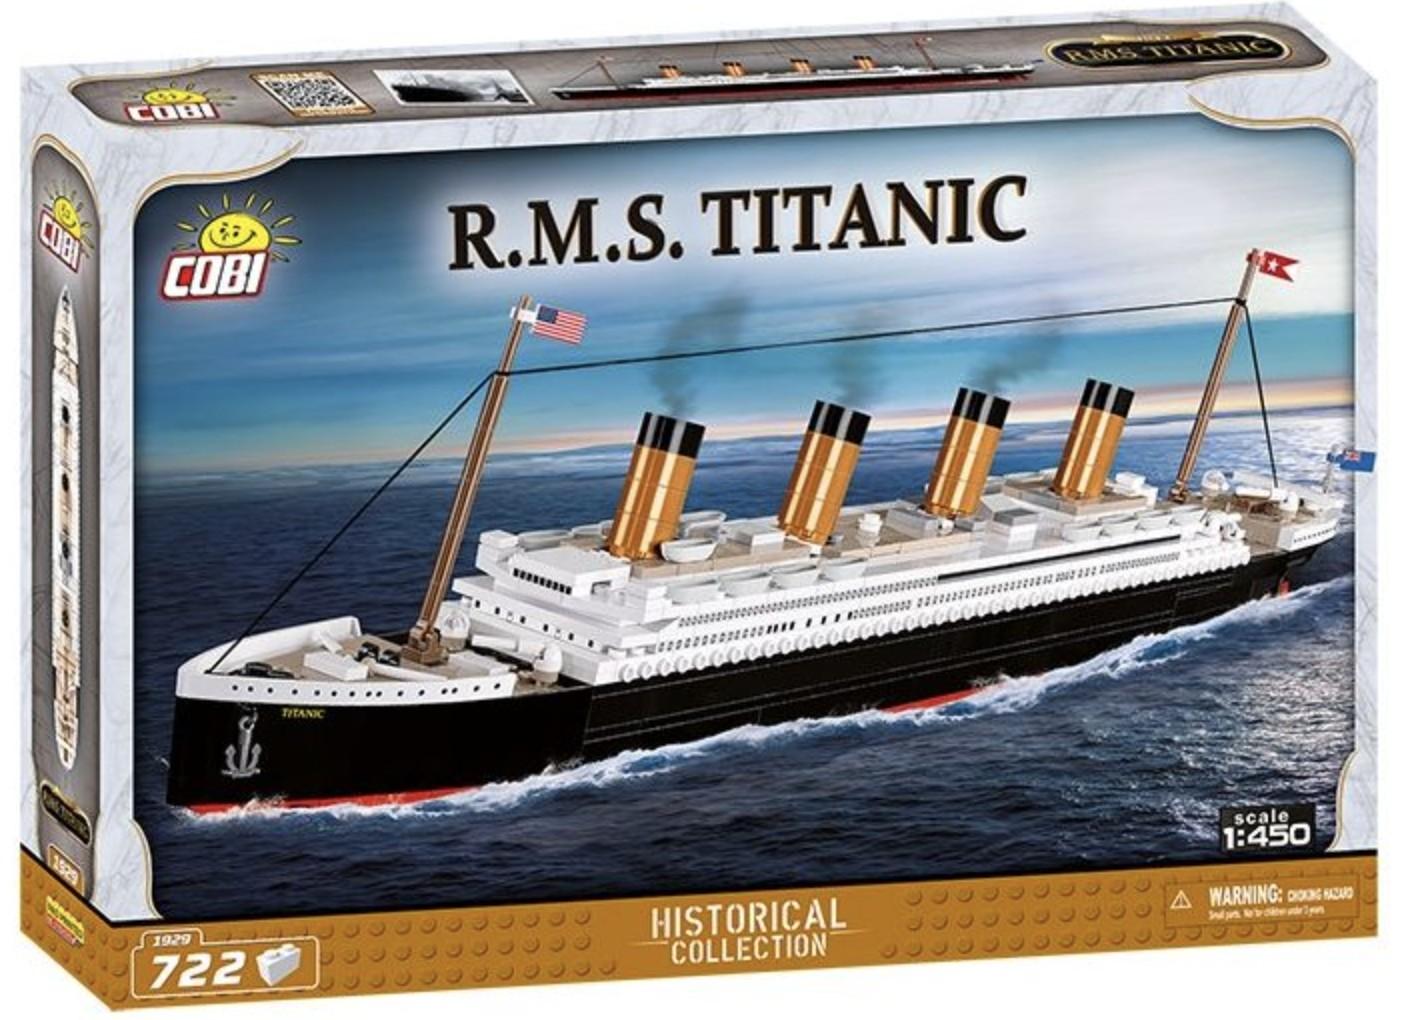 1929 - RMS Titanic 1:450